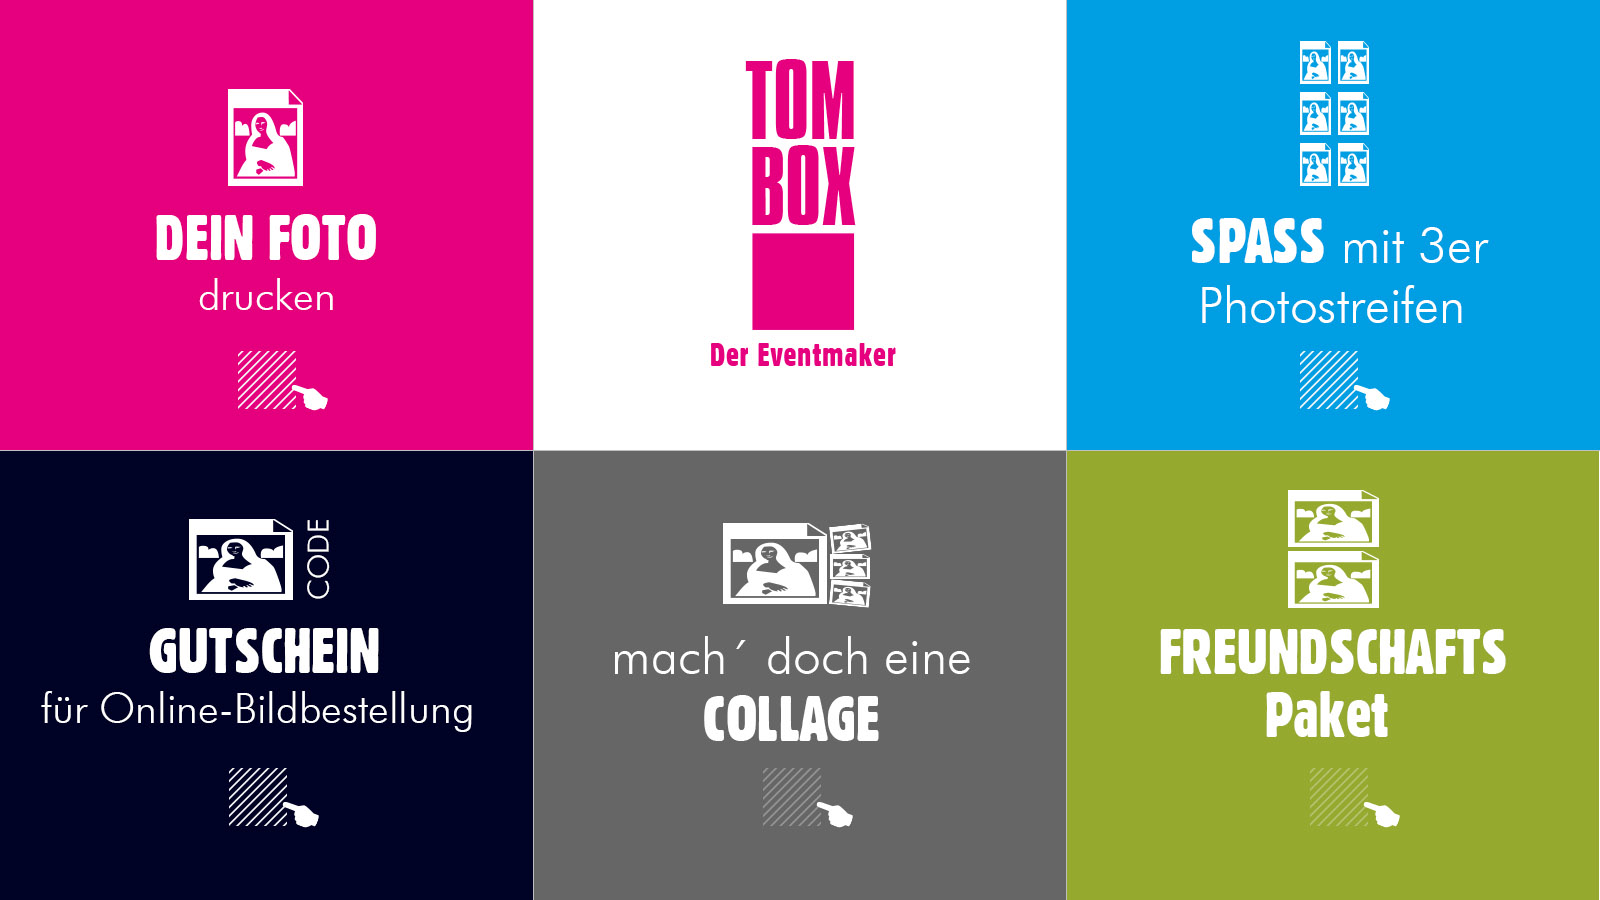 Marenti Werbeagentur, Werbung, Fahrzeugwerbung, Werbefotografie, Fotobox, Fotobox mieten, Event, Freiberg, Chemnitz, Sachsen